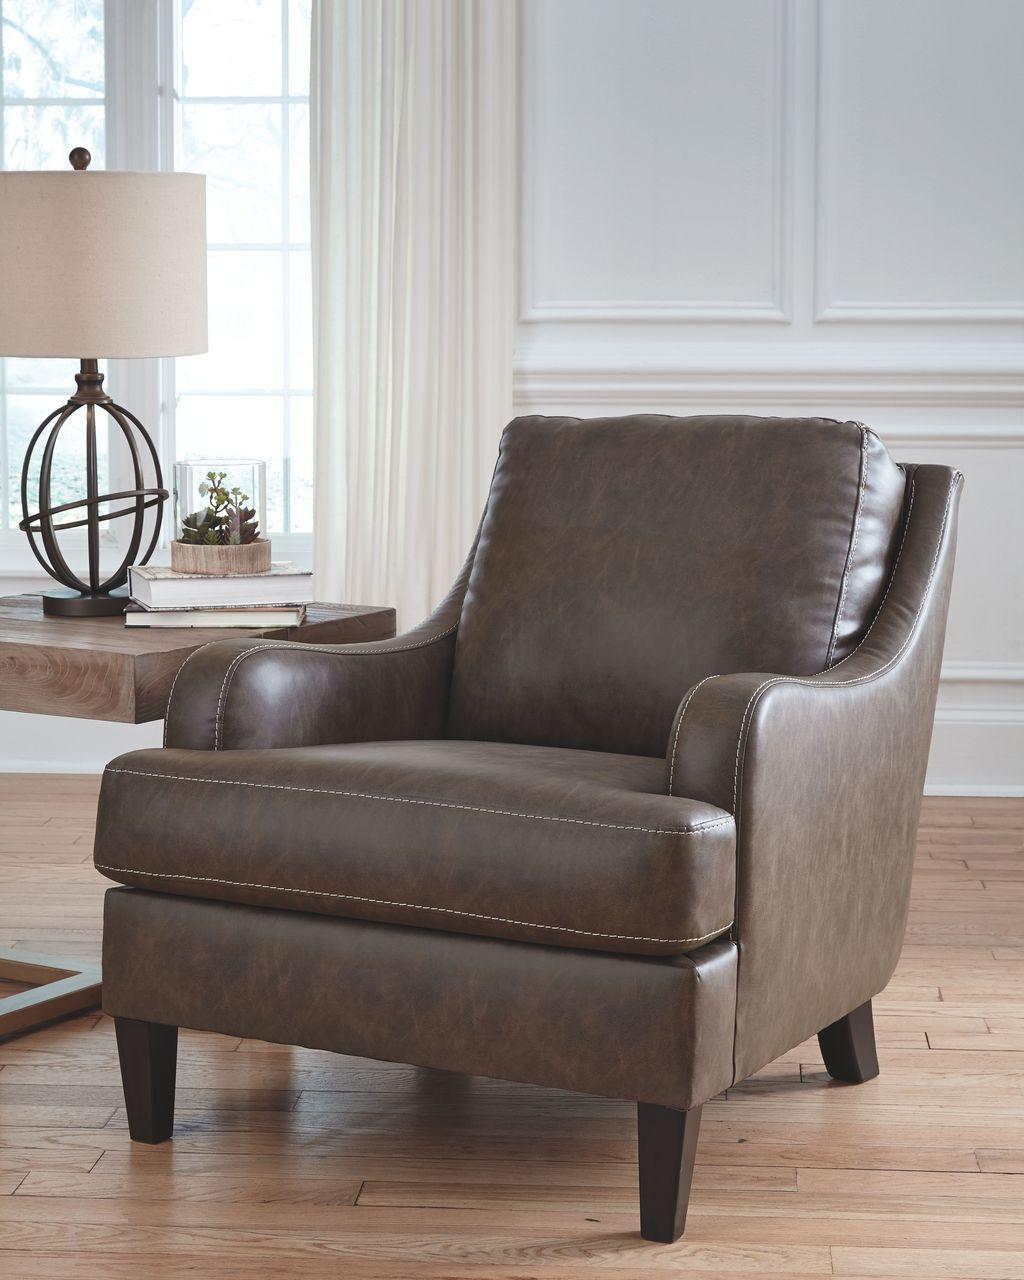 Rent A Center Accent Chairs.Tirolo Walnut Accent Chair